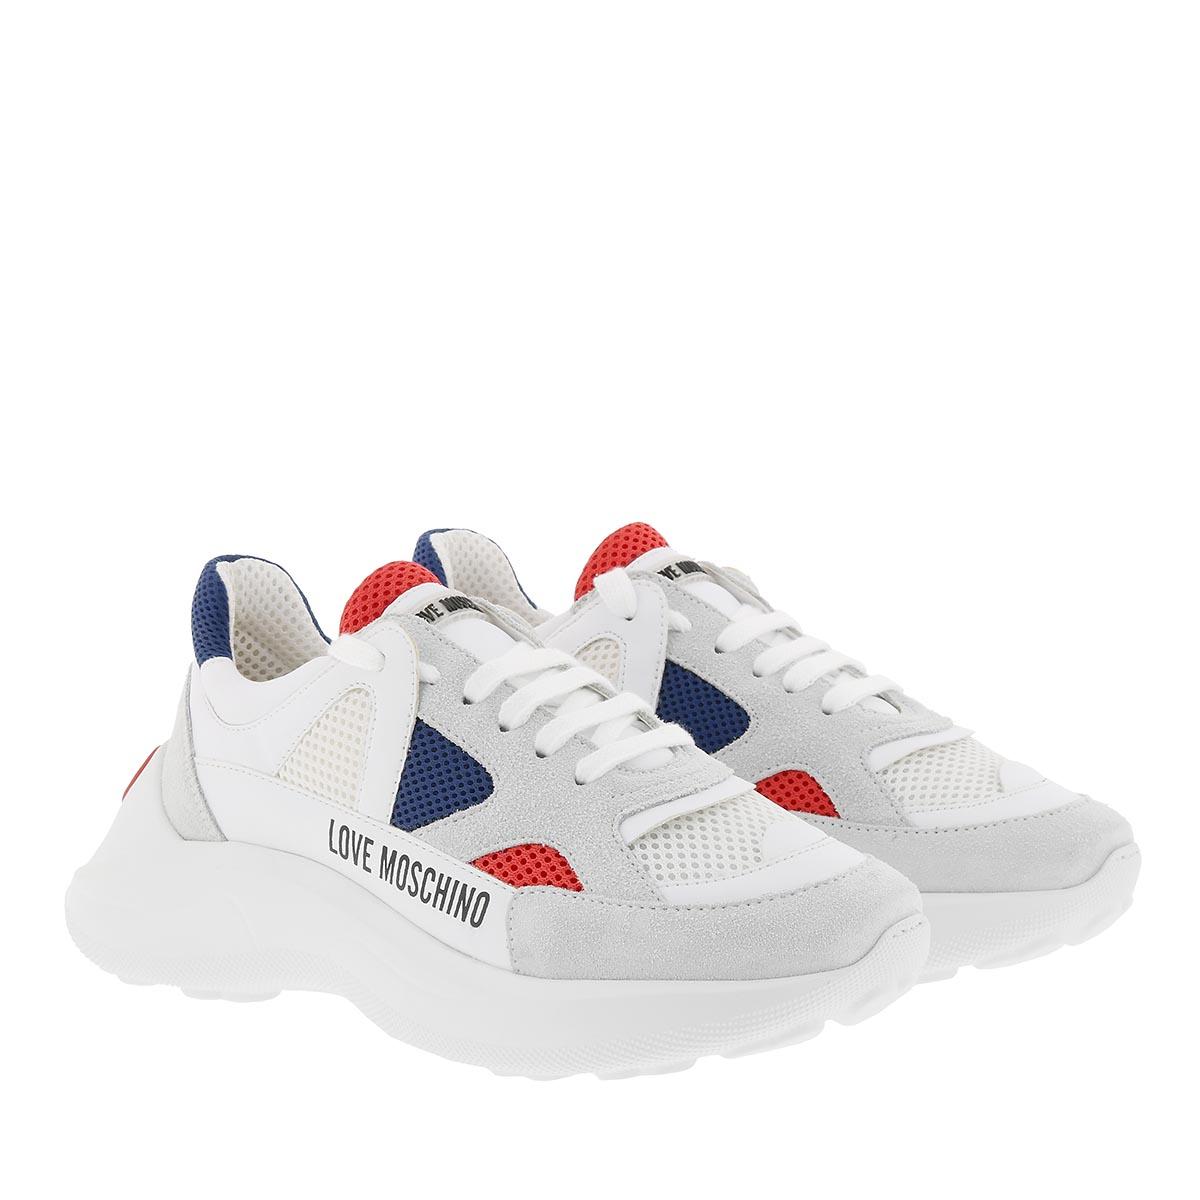 Love Moschino Sneakers - Running Sneaker Multicolor - in weiß - für Damen